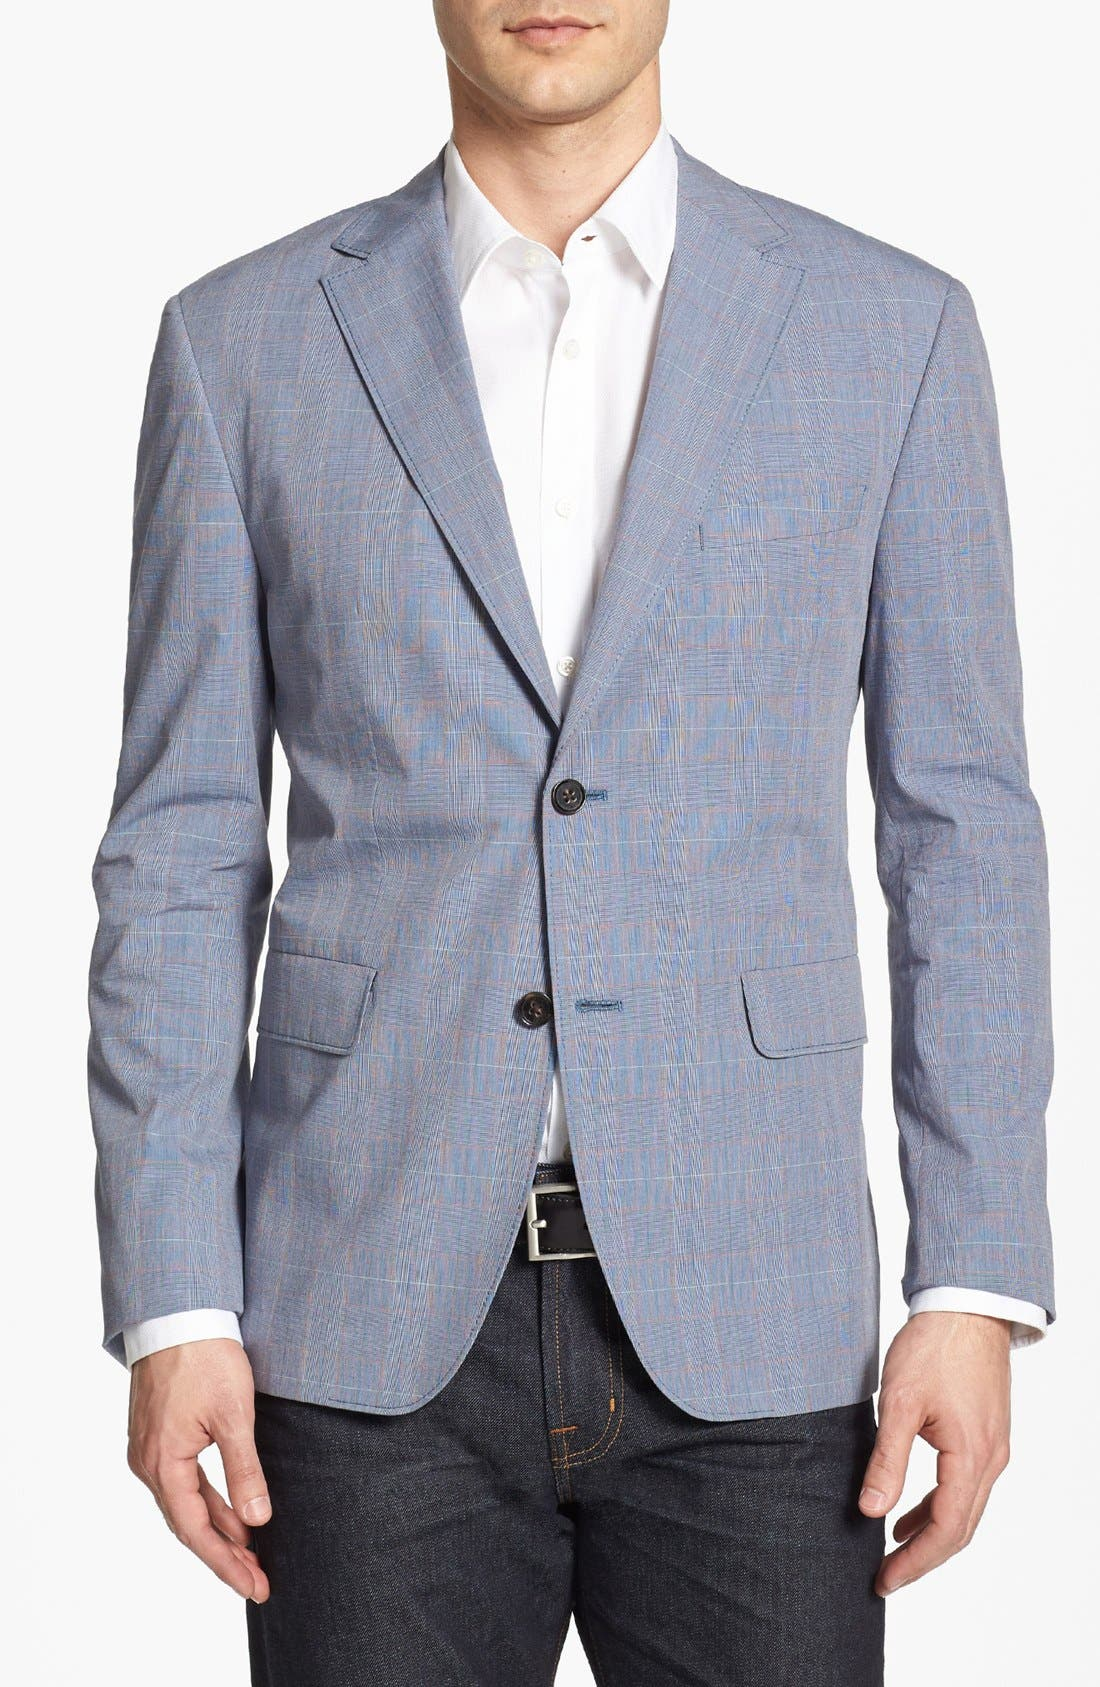 Alternate Image 1 Selected - BOSS HUGO BOSS 'Coastu' Sportcoat